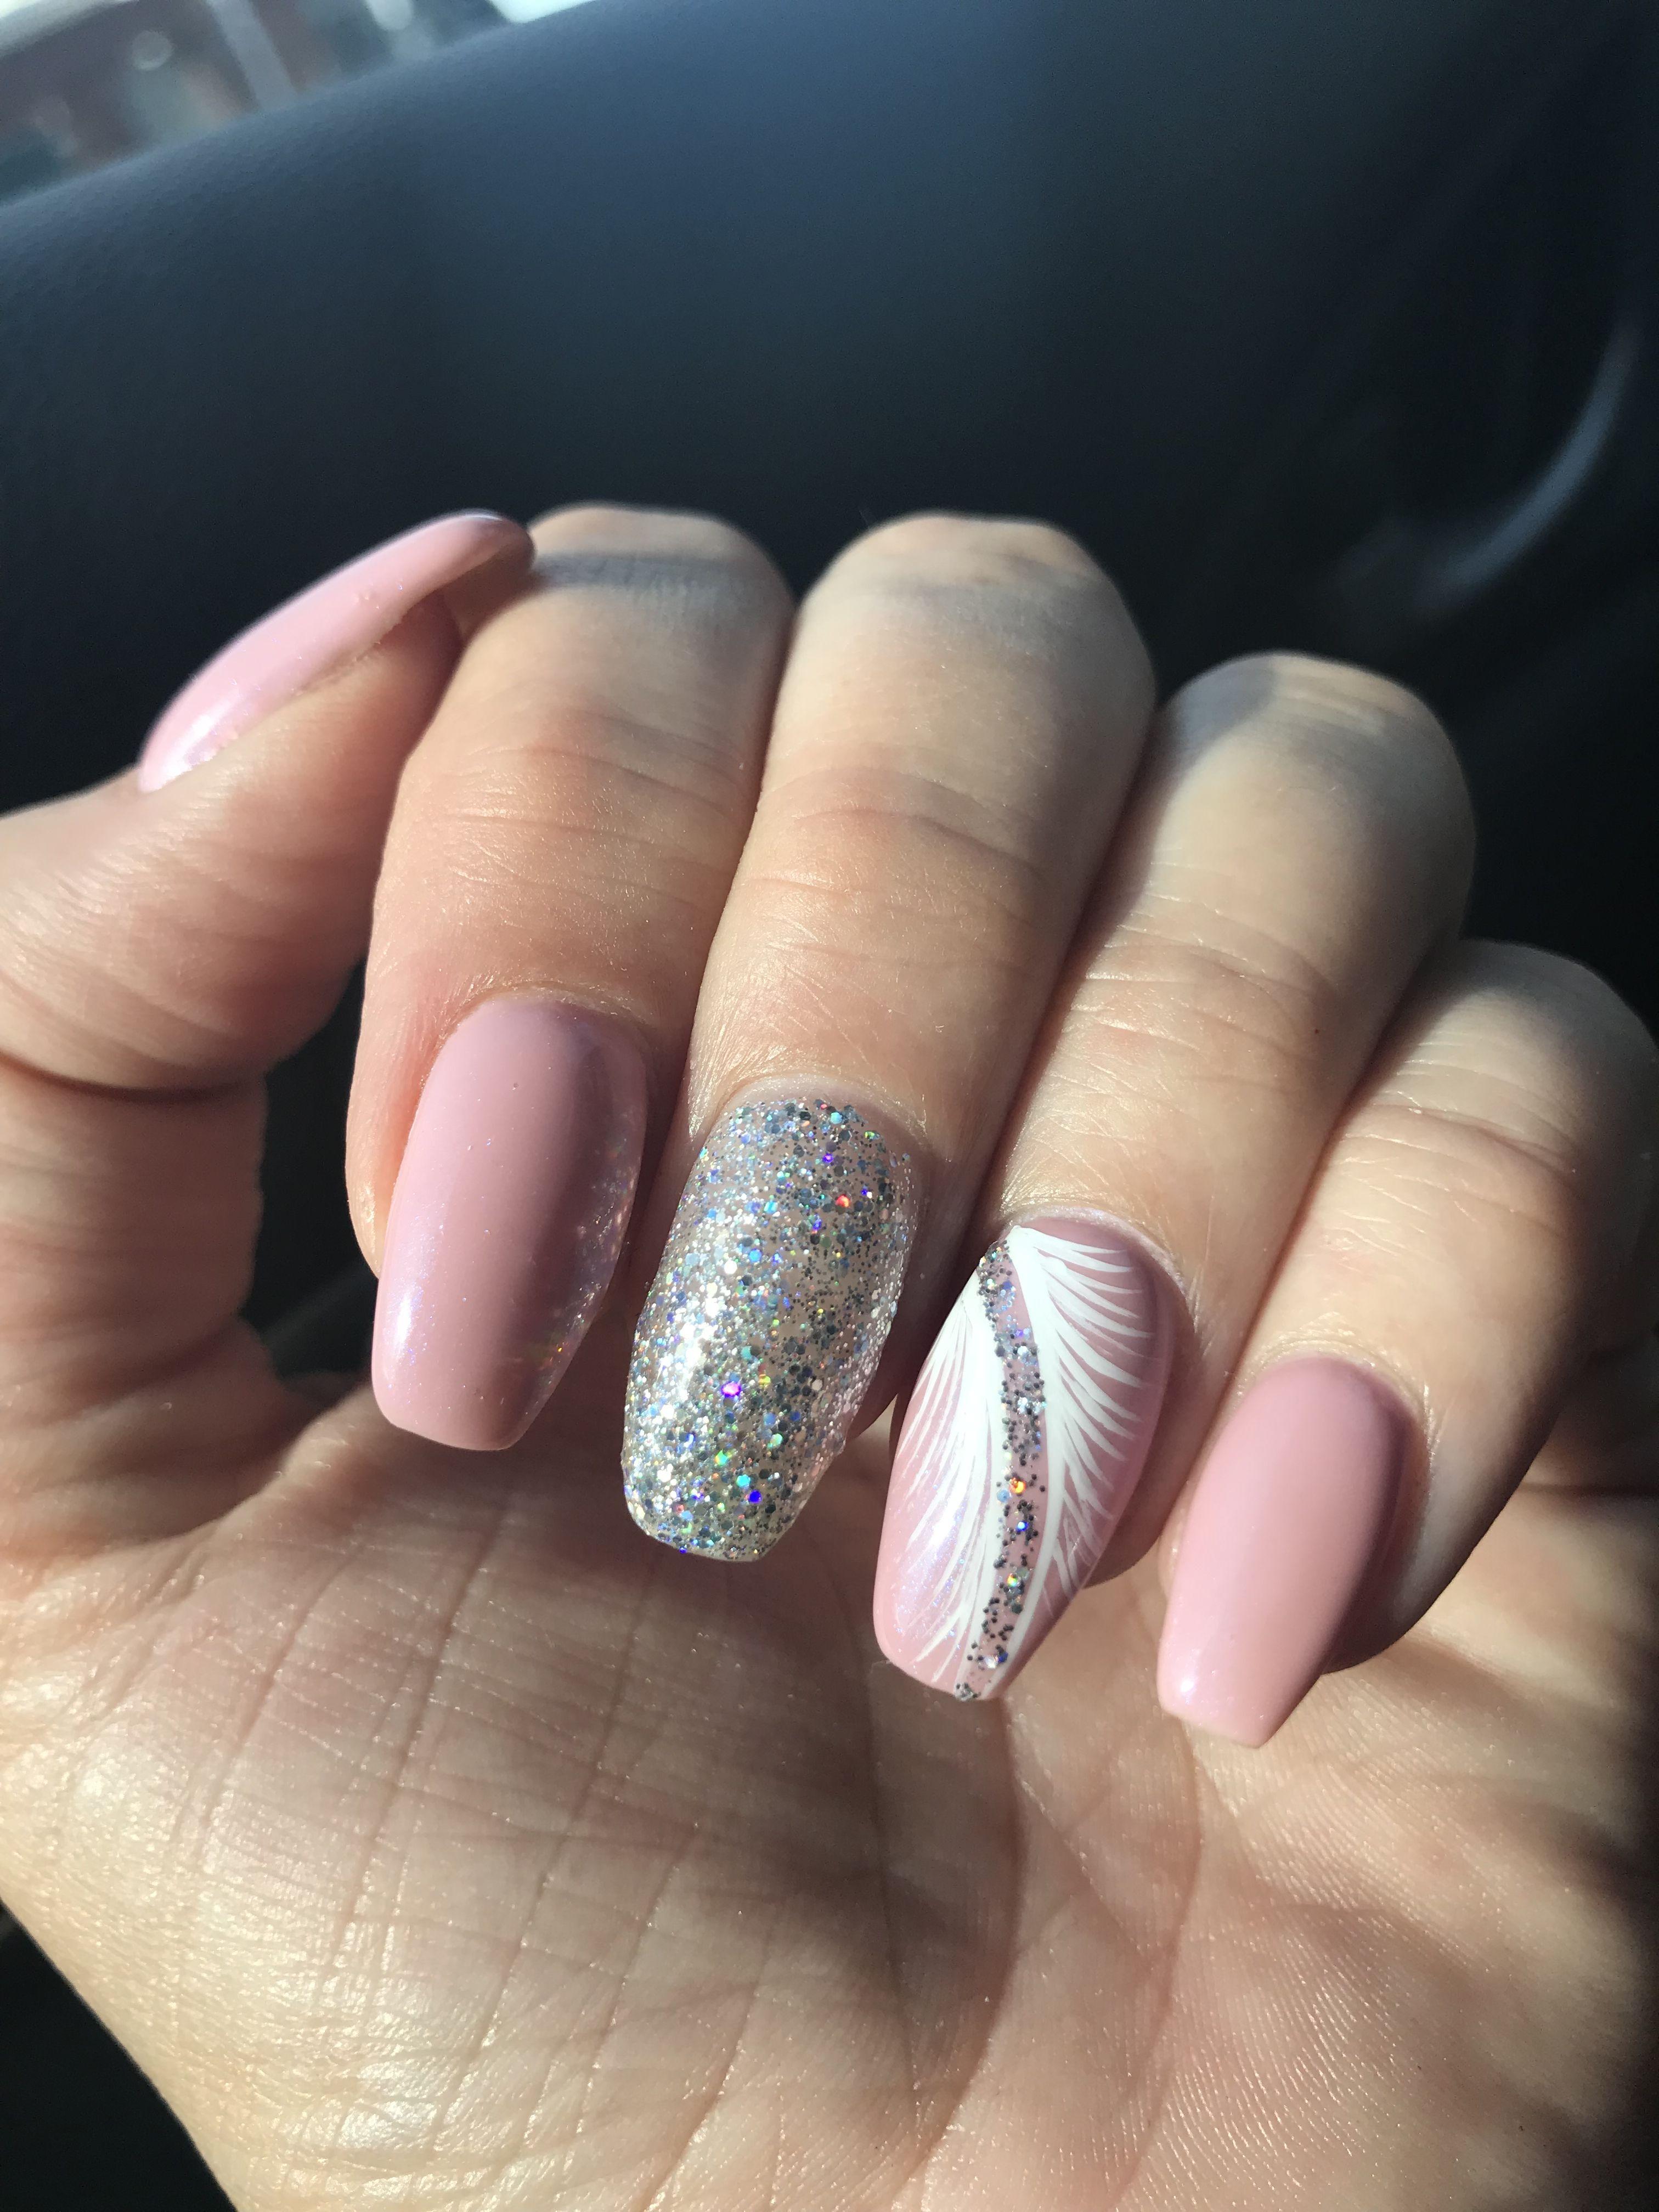 Summer 2018 Nail Design Coffin Shaped Uv Gel Nails Gel Nail Extensions Uv Gel Nails Glitter Gel Nails